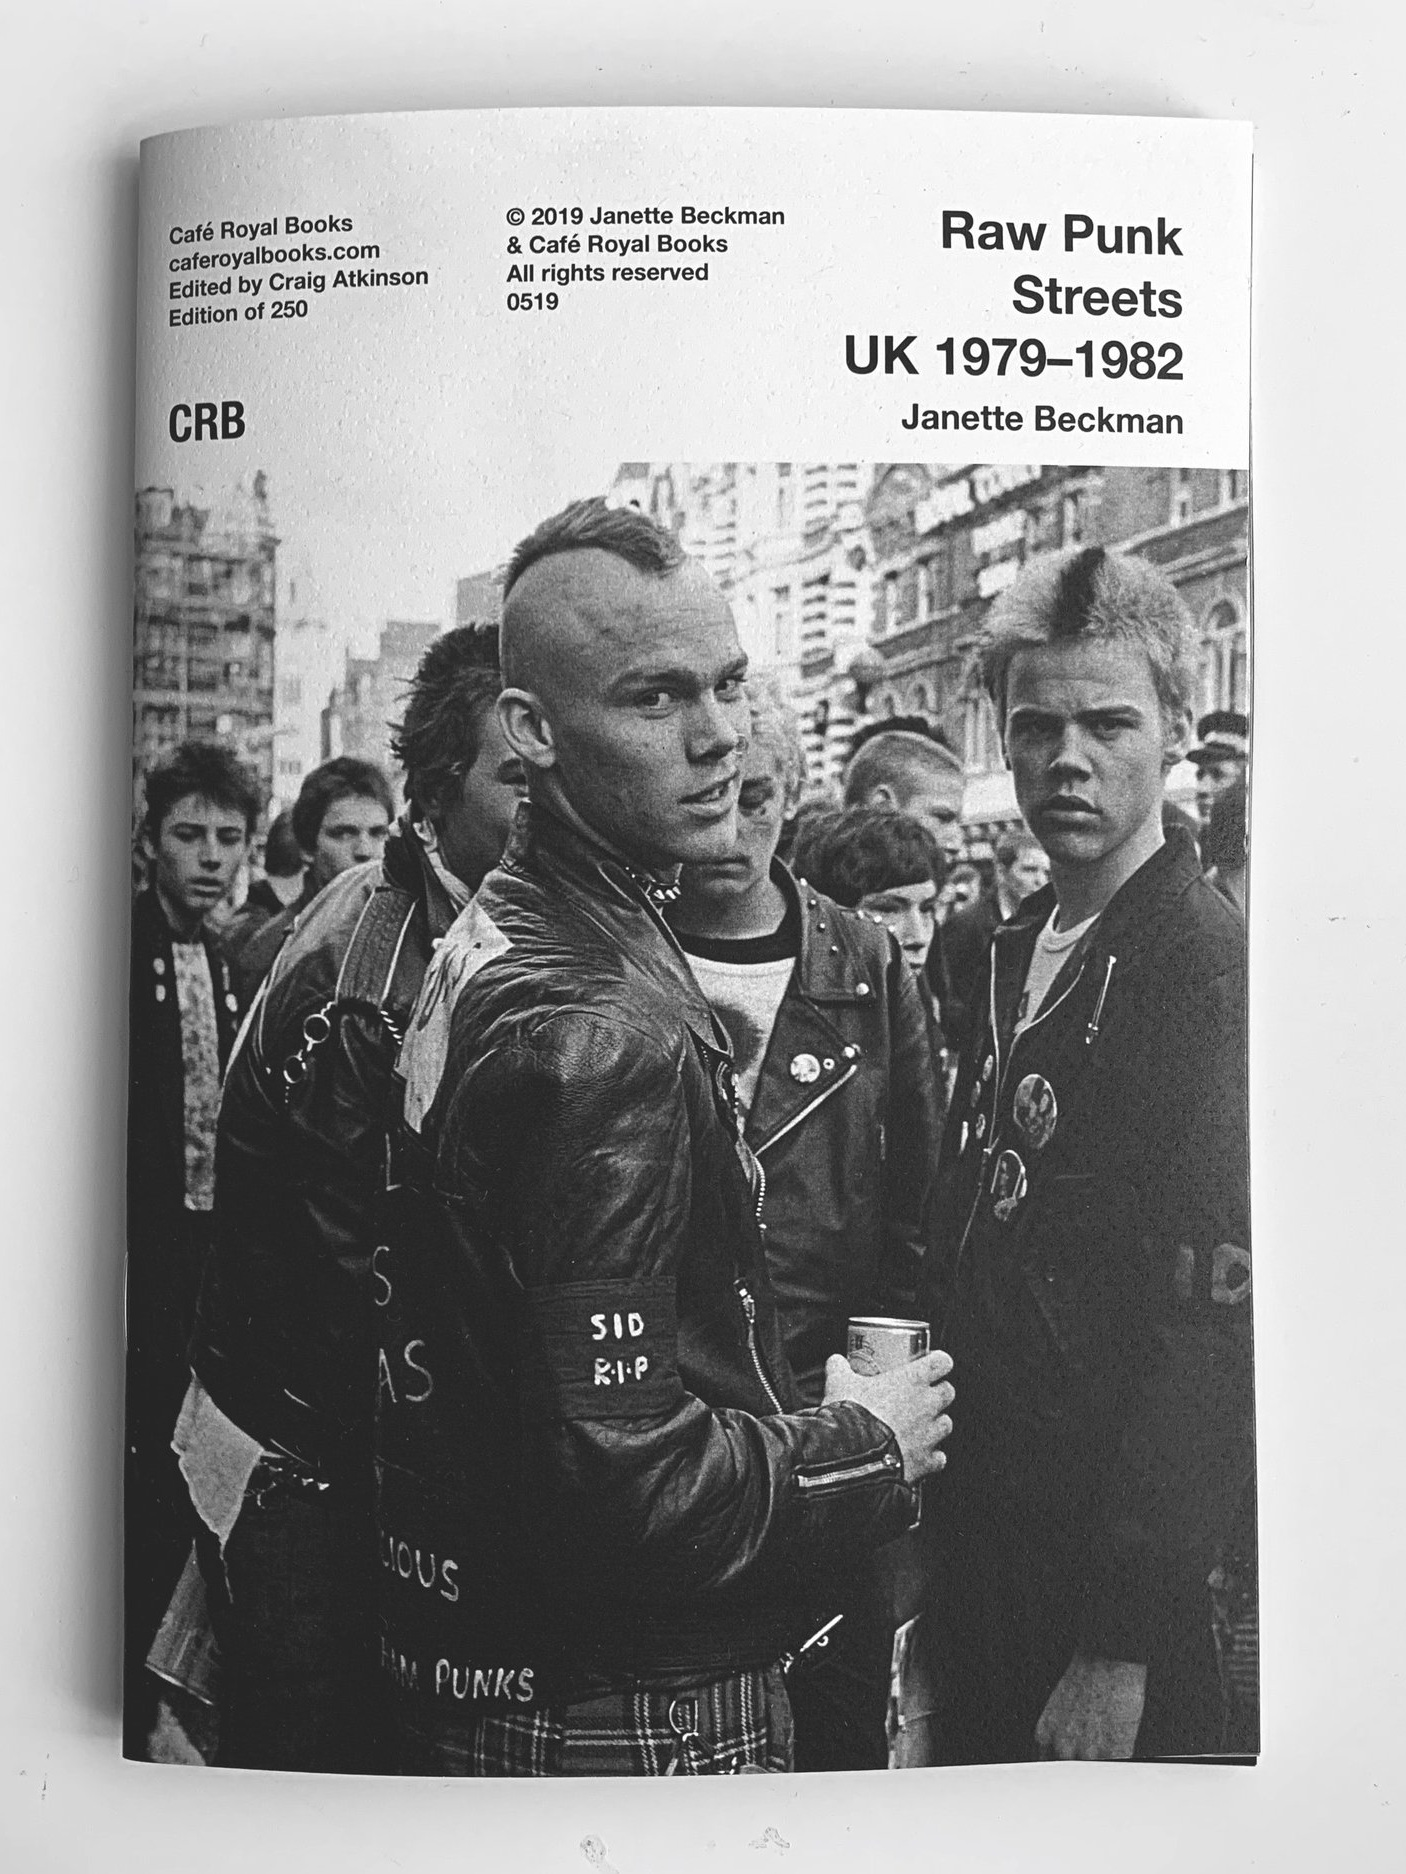 Raw Punk Street 1979-1982, Janette Beckman